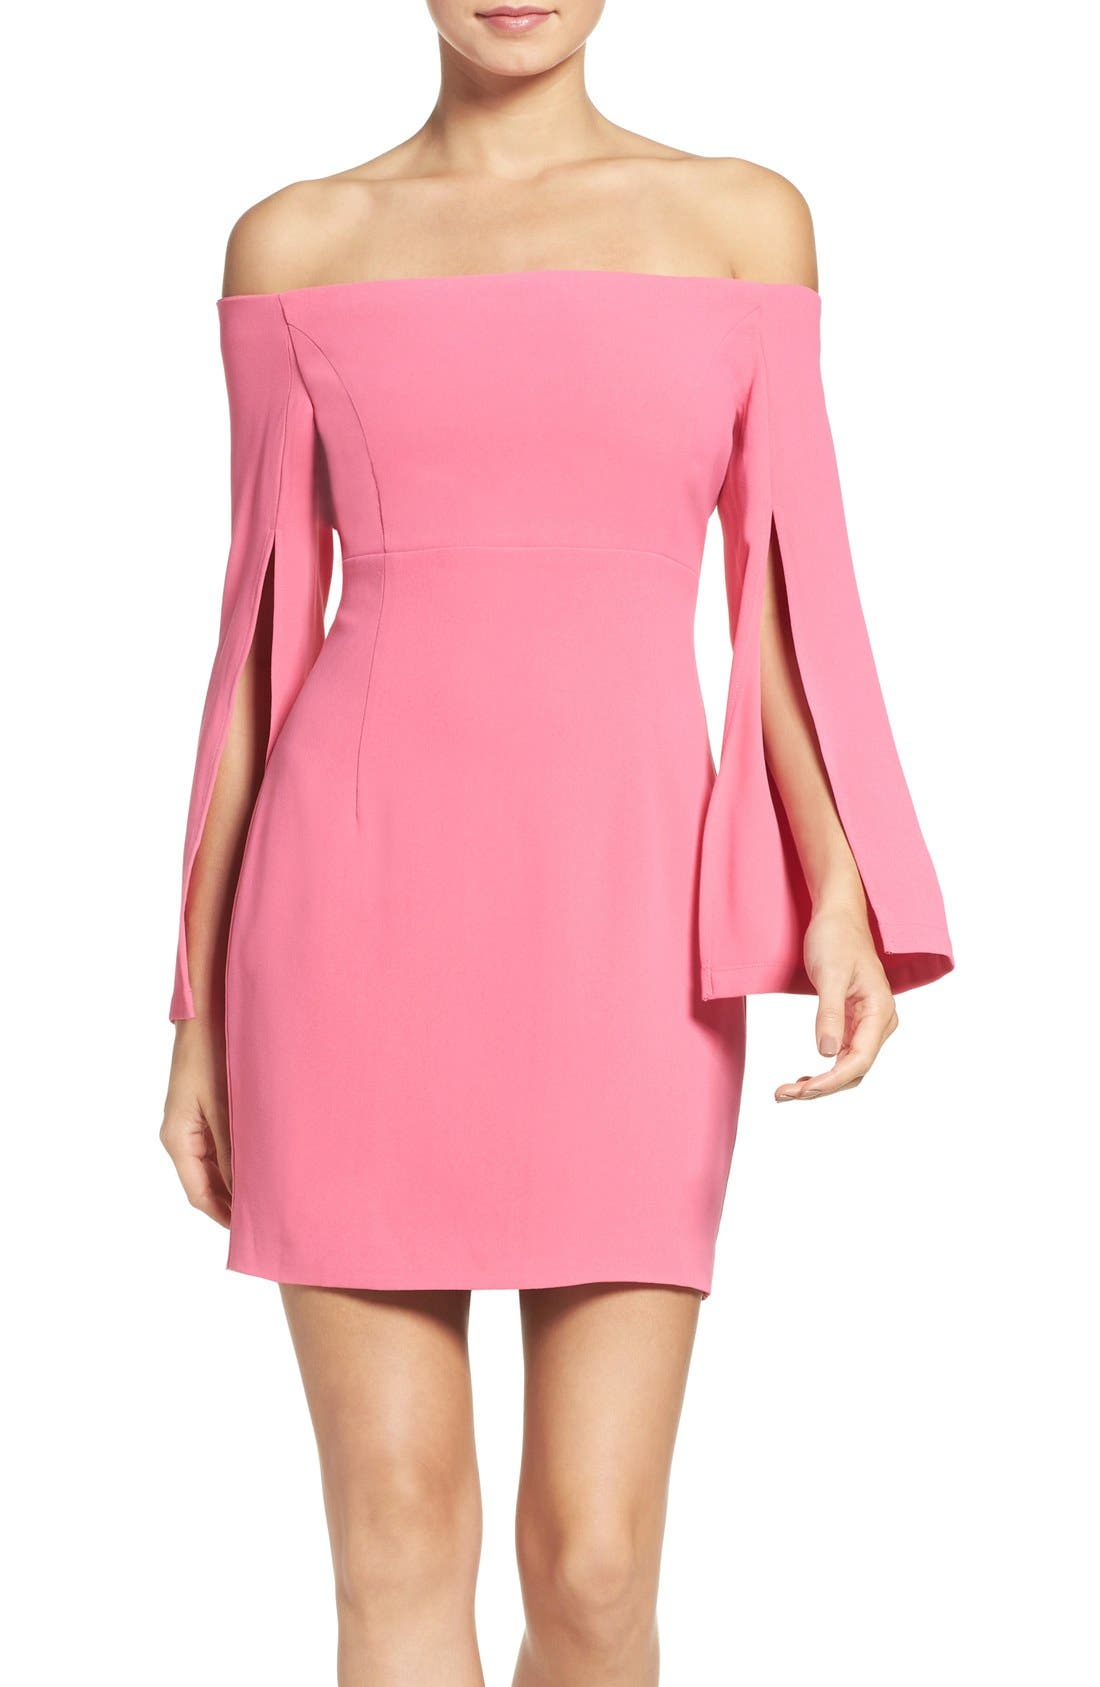 Ava Off the Shoulder Dress,                             Main thumbnail 1, color,                             Tulip Pink